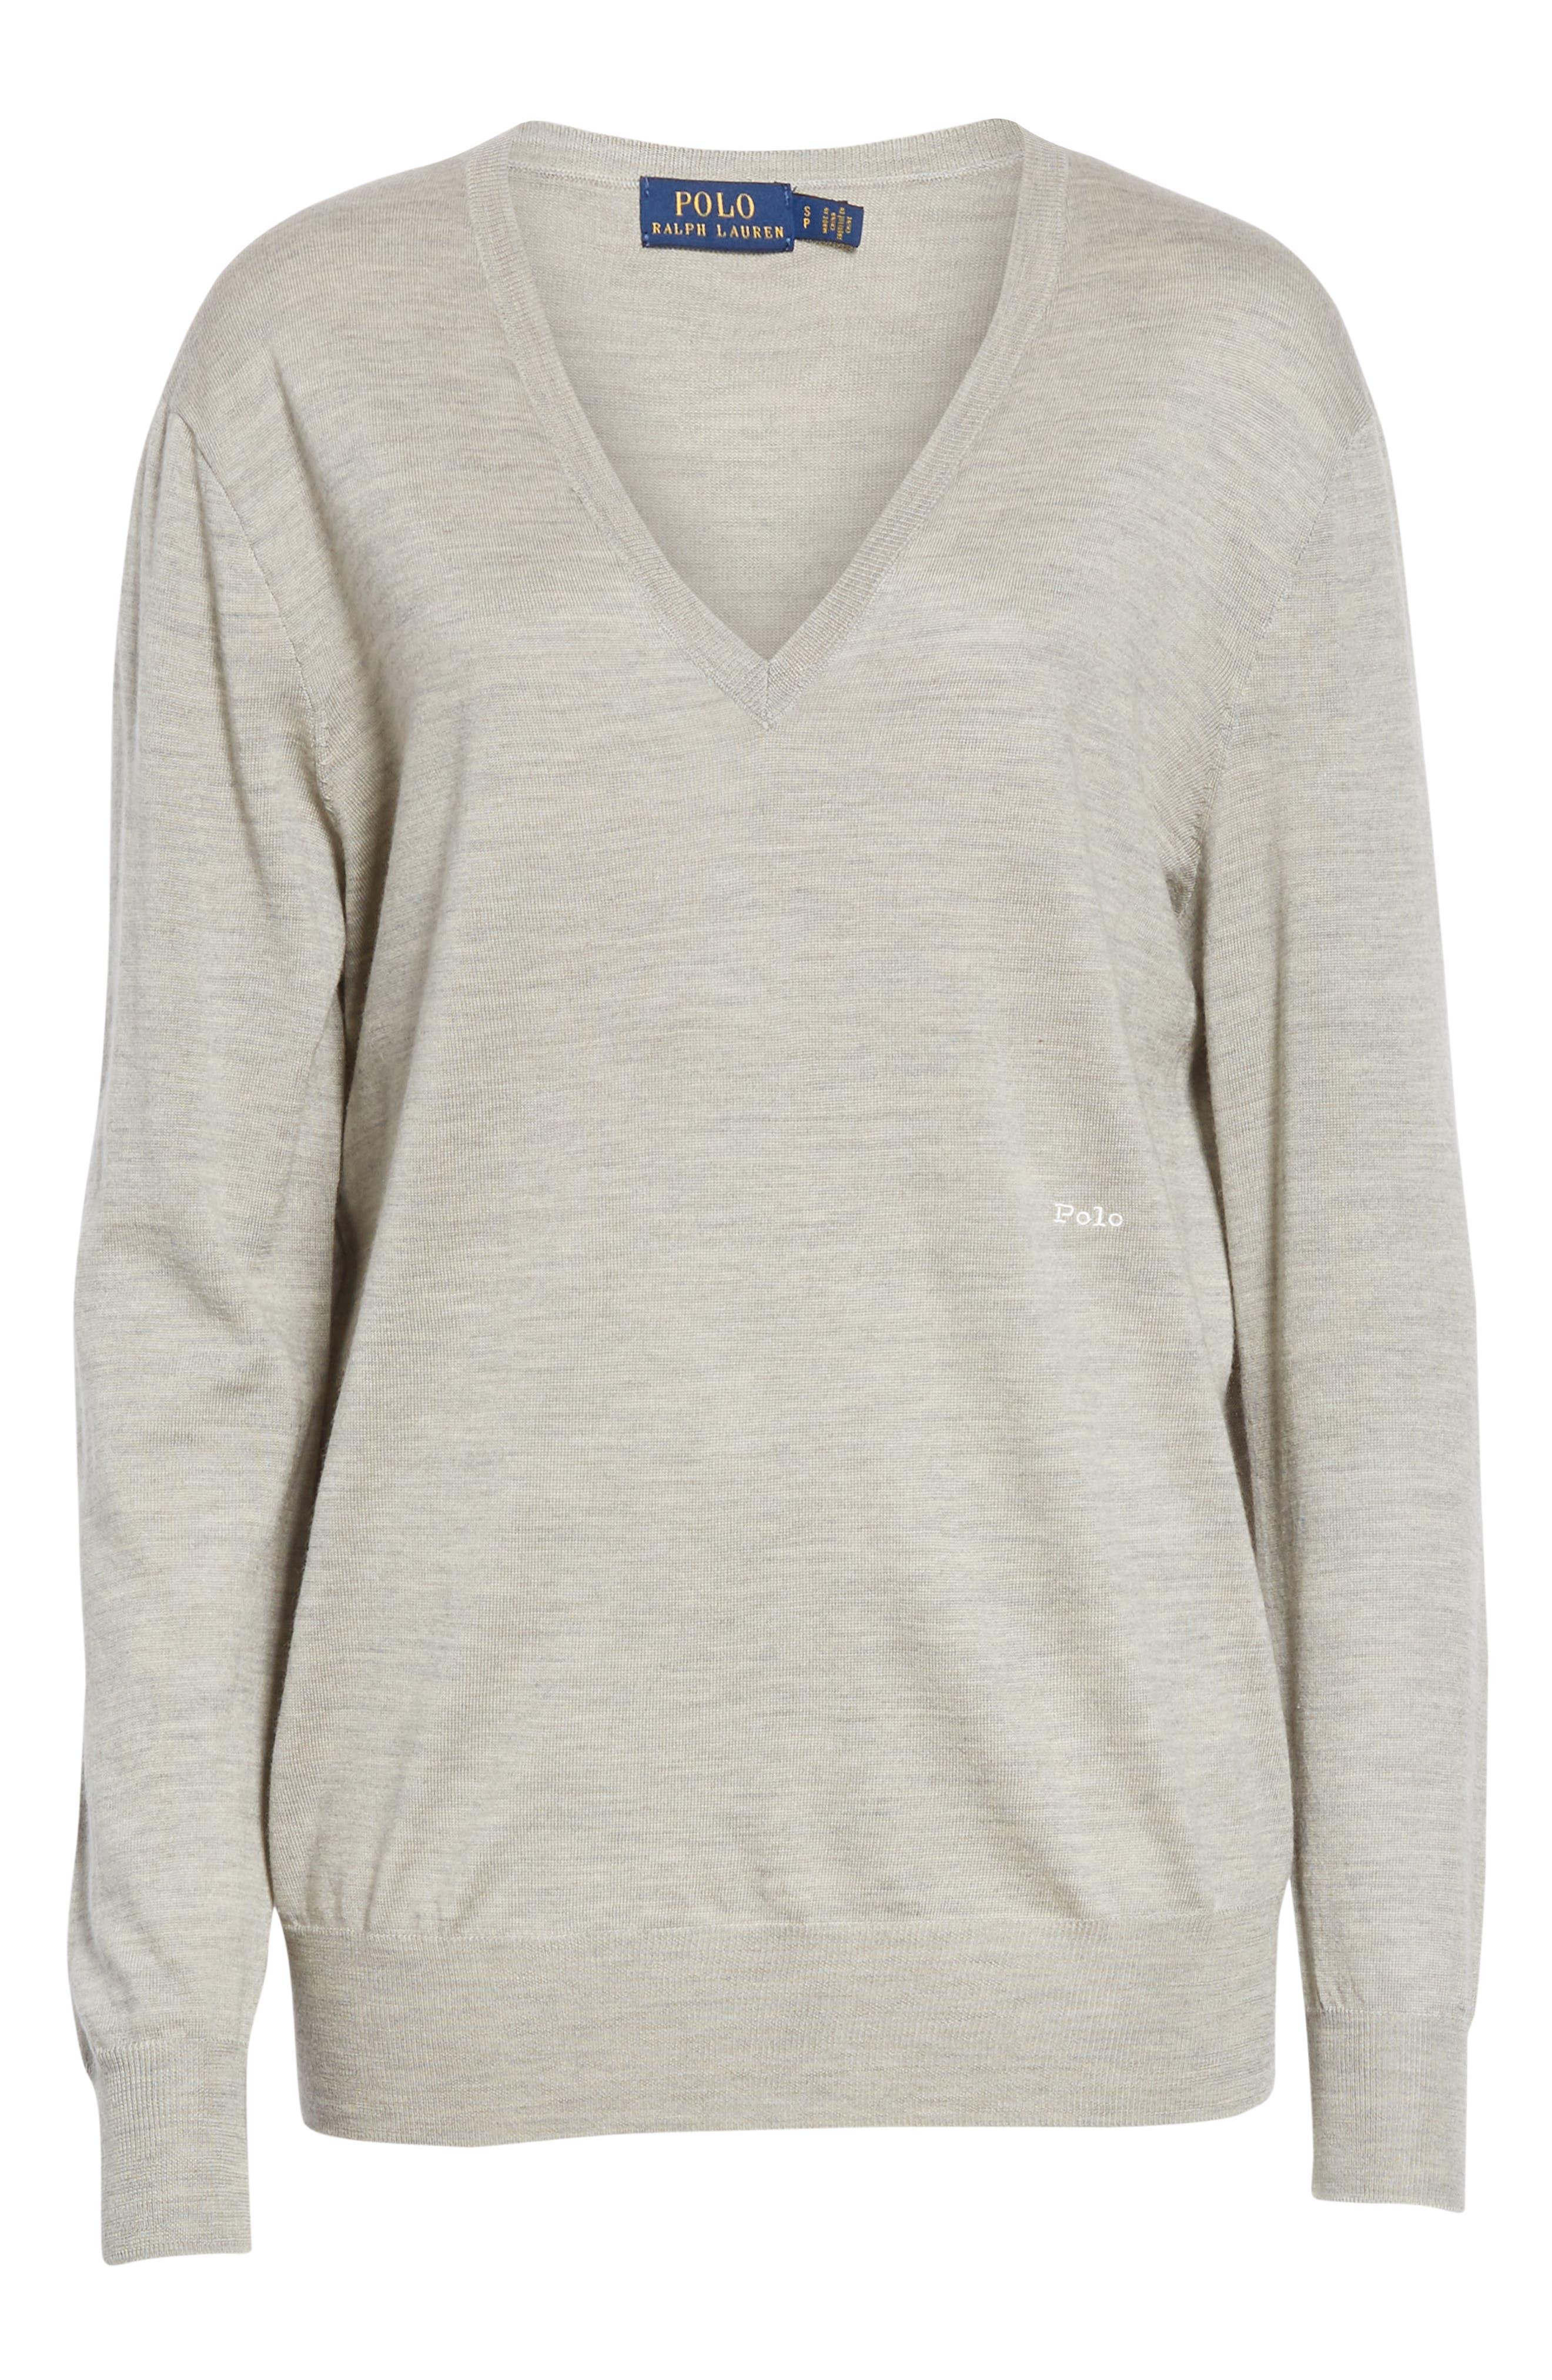 POLO RALPH LAUREN,                             V-Neck Wool, Silk & Cashmere Sweater,                             Alternate thumbnail 6, color,                             LIGHT VINTAGE HEATHER